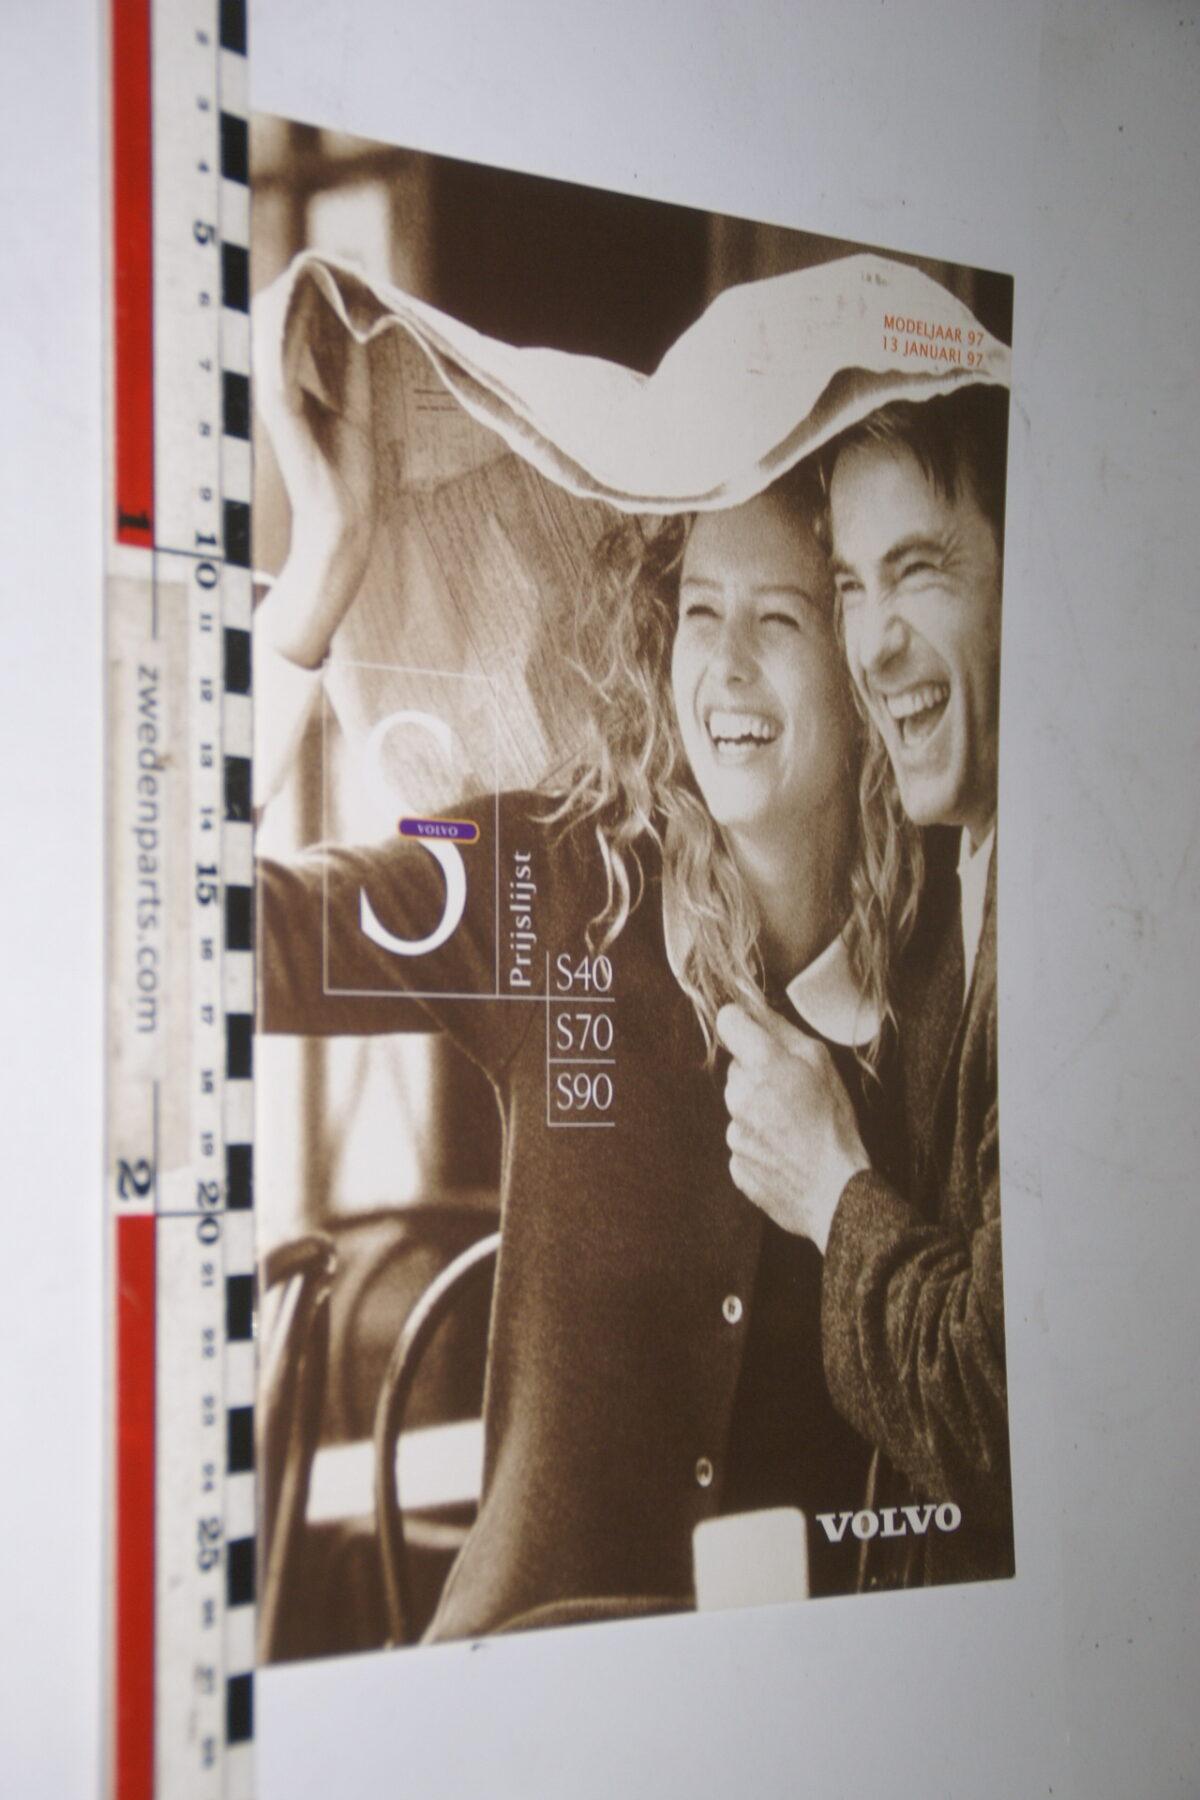 DSC04988 1997 originele brochure nr. VO19701-13 Volvo S40 S70 S90-aacf3e3f